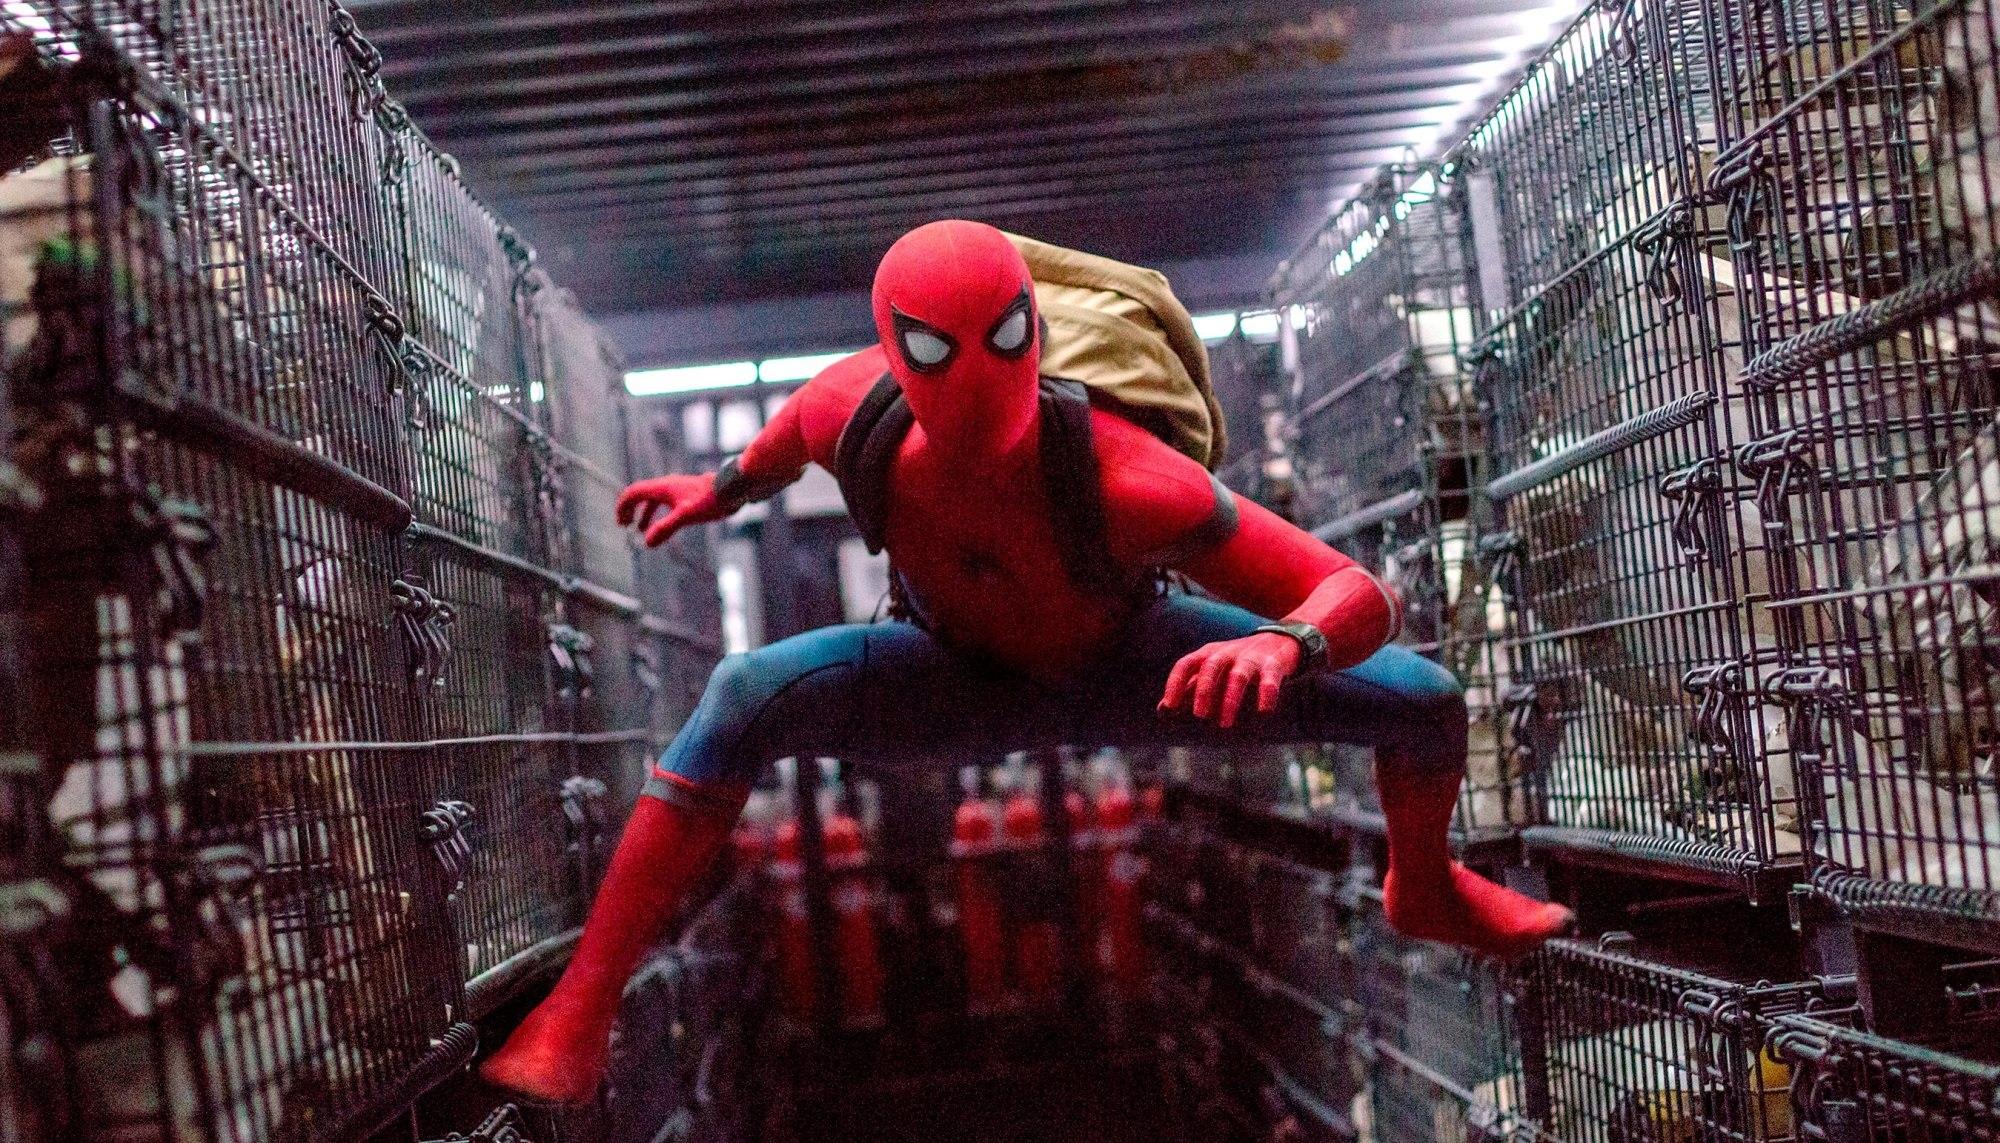 https://cinemaplanet.pt/wp-content/uploads/2017/06/spiderman1-992310.jpg